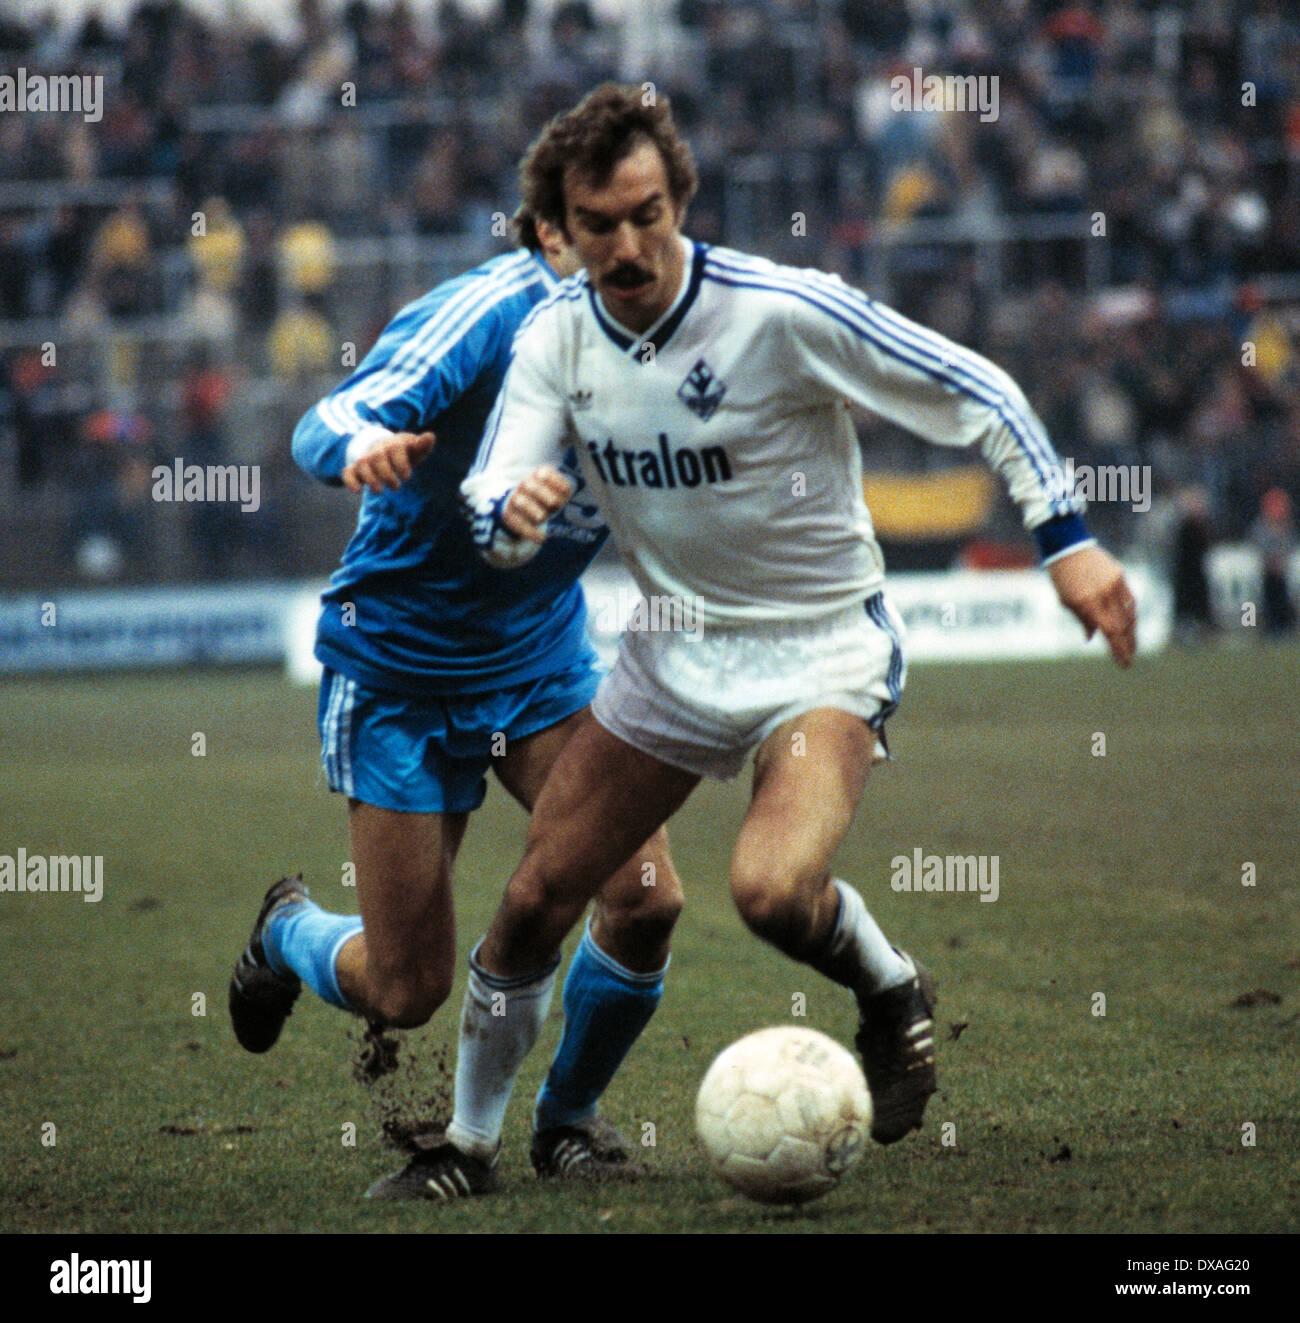 football, Bundesliga, 1984/1985, Grotenburg Stadium, FC Bayer 05 Uerdingen versus SV Waldhof Mannheim 2:2, scene of the match, Werner Heck (SVW) - Stock Image